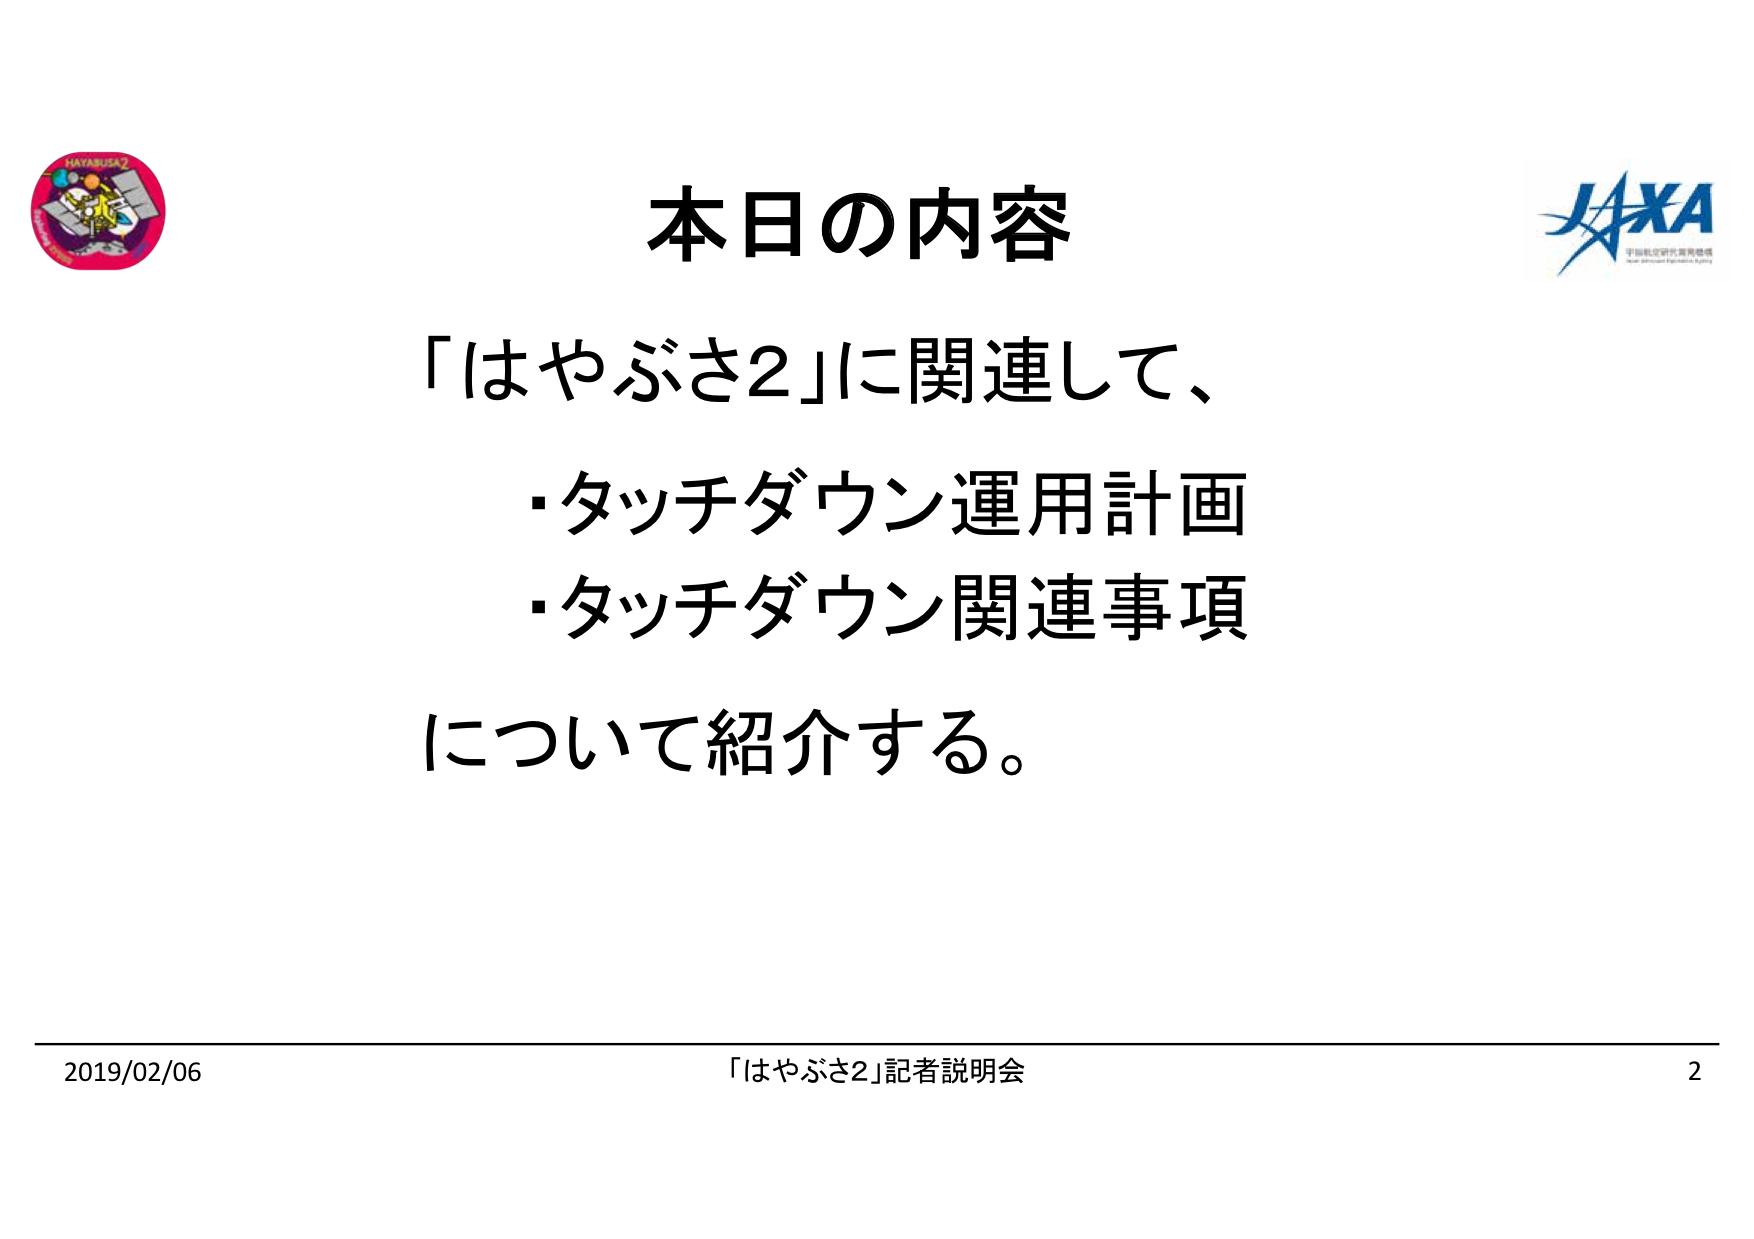 f:id:Imamura:20190204175456p:plain